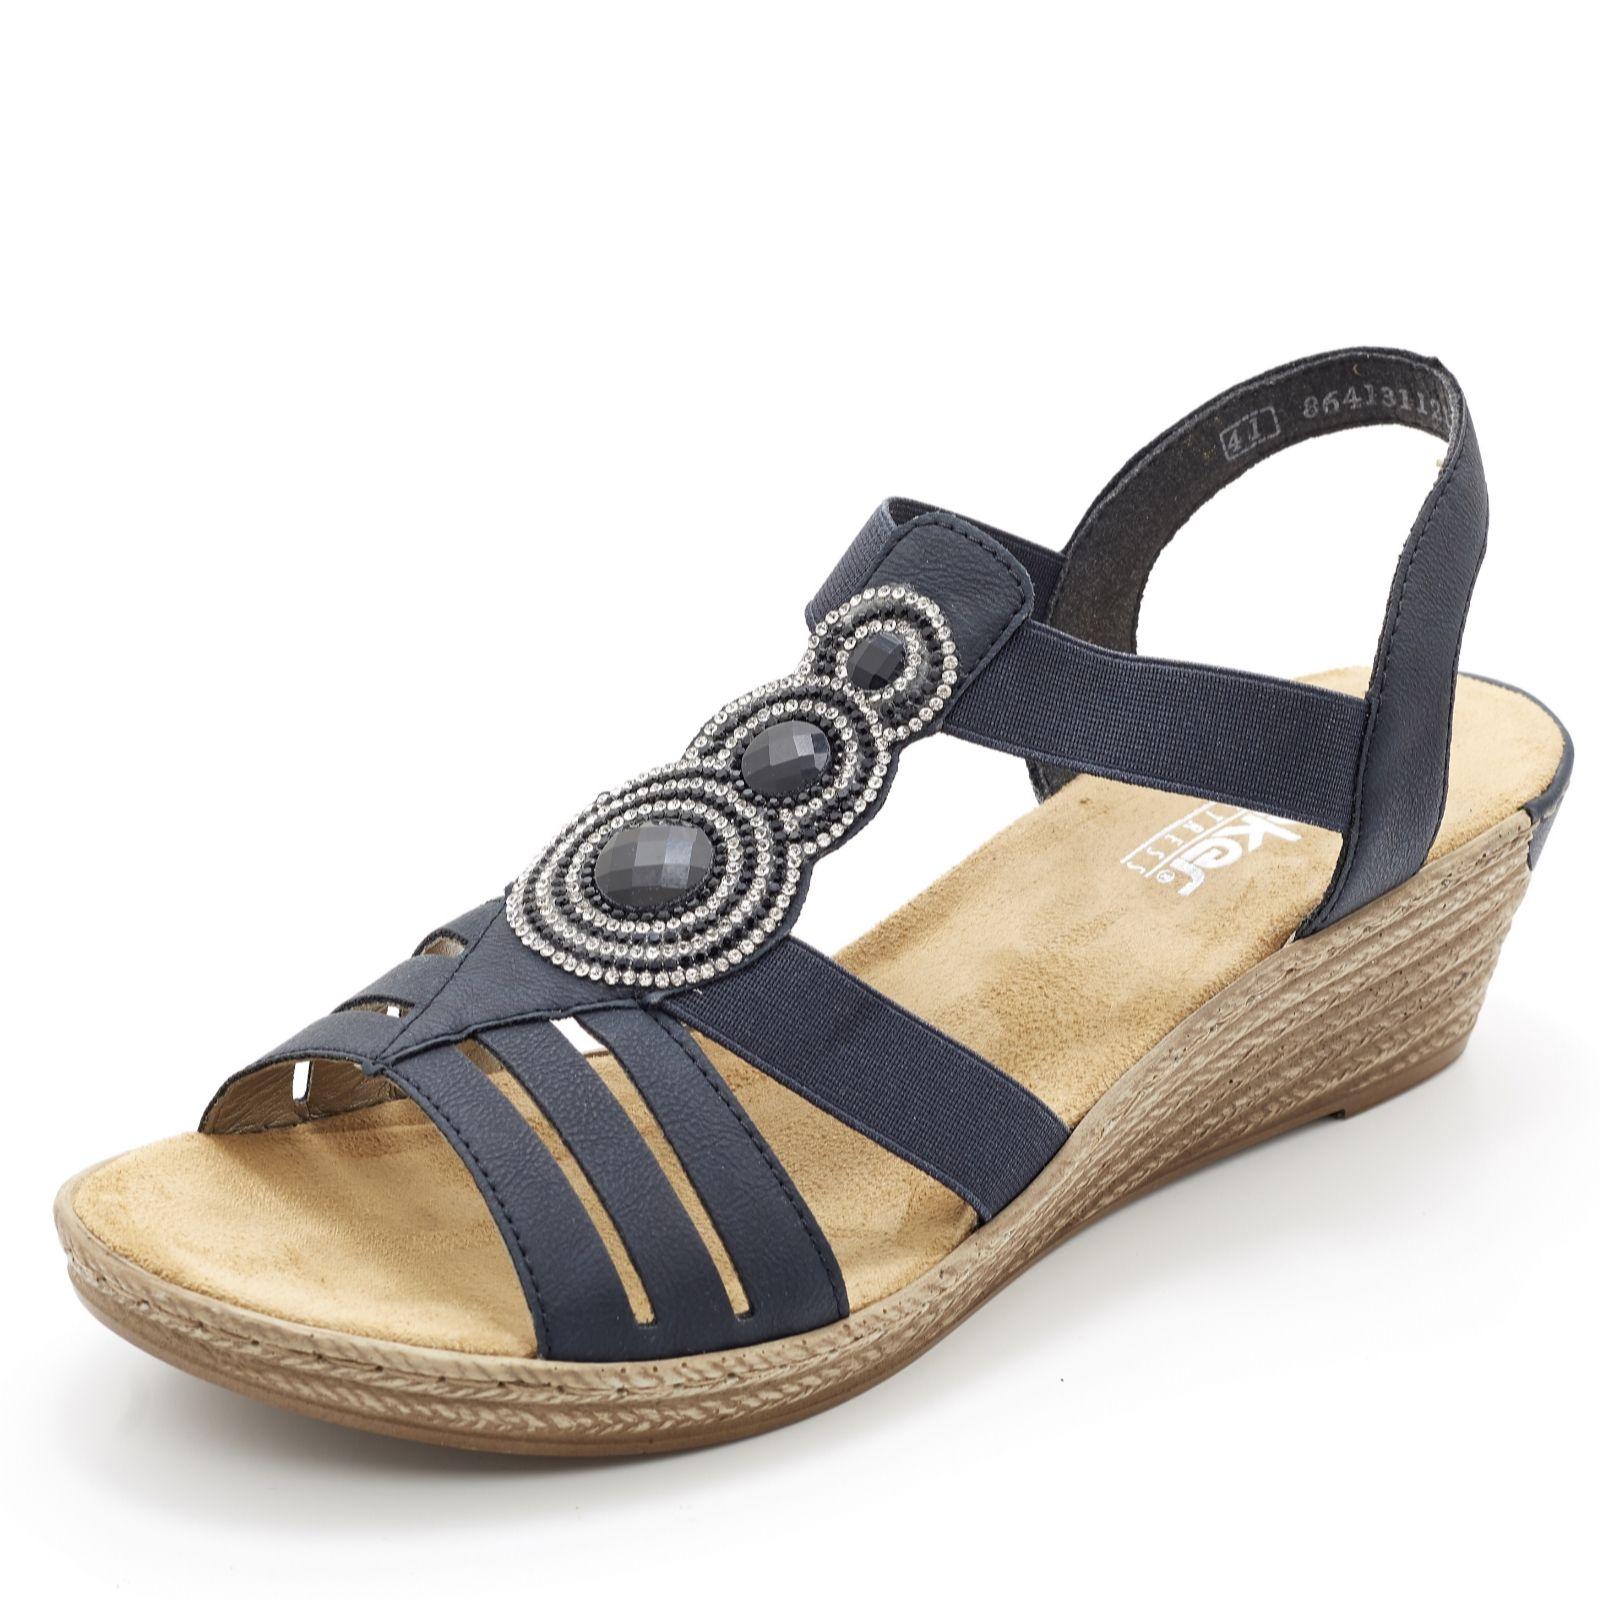 Rieker Wedge Sandal with Embellished Disc Detail - 164070